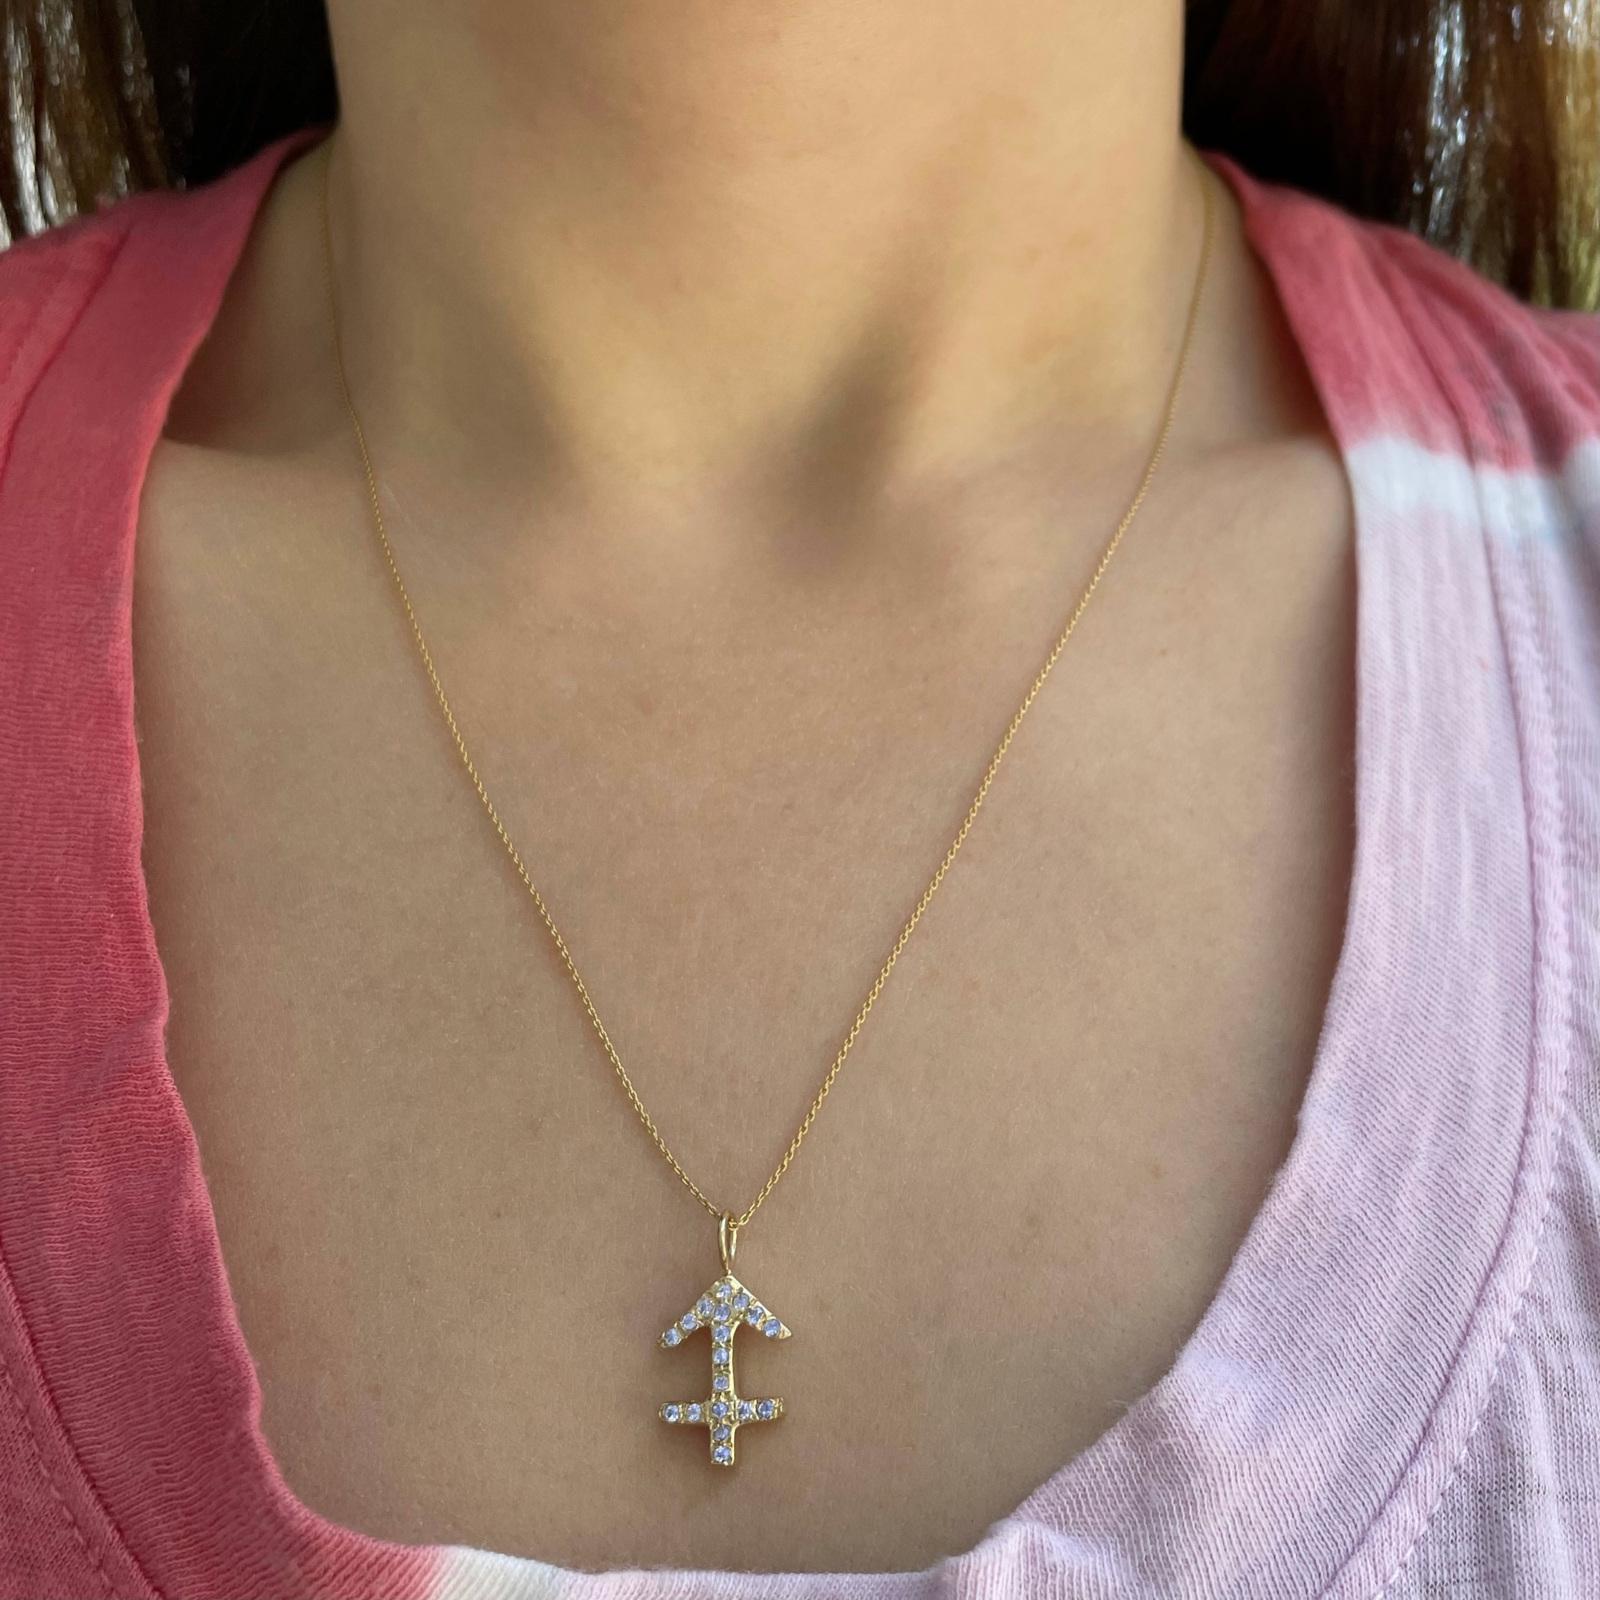 Sagittarius zodiac sign charm pendant necklace